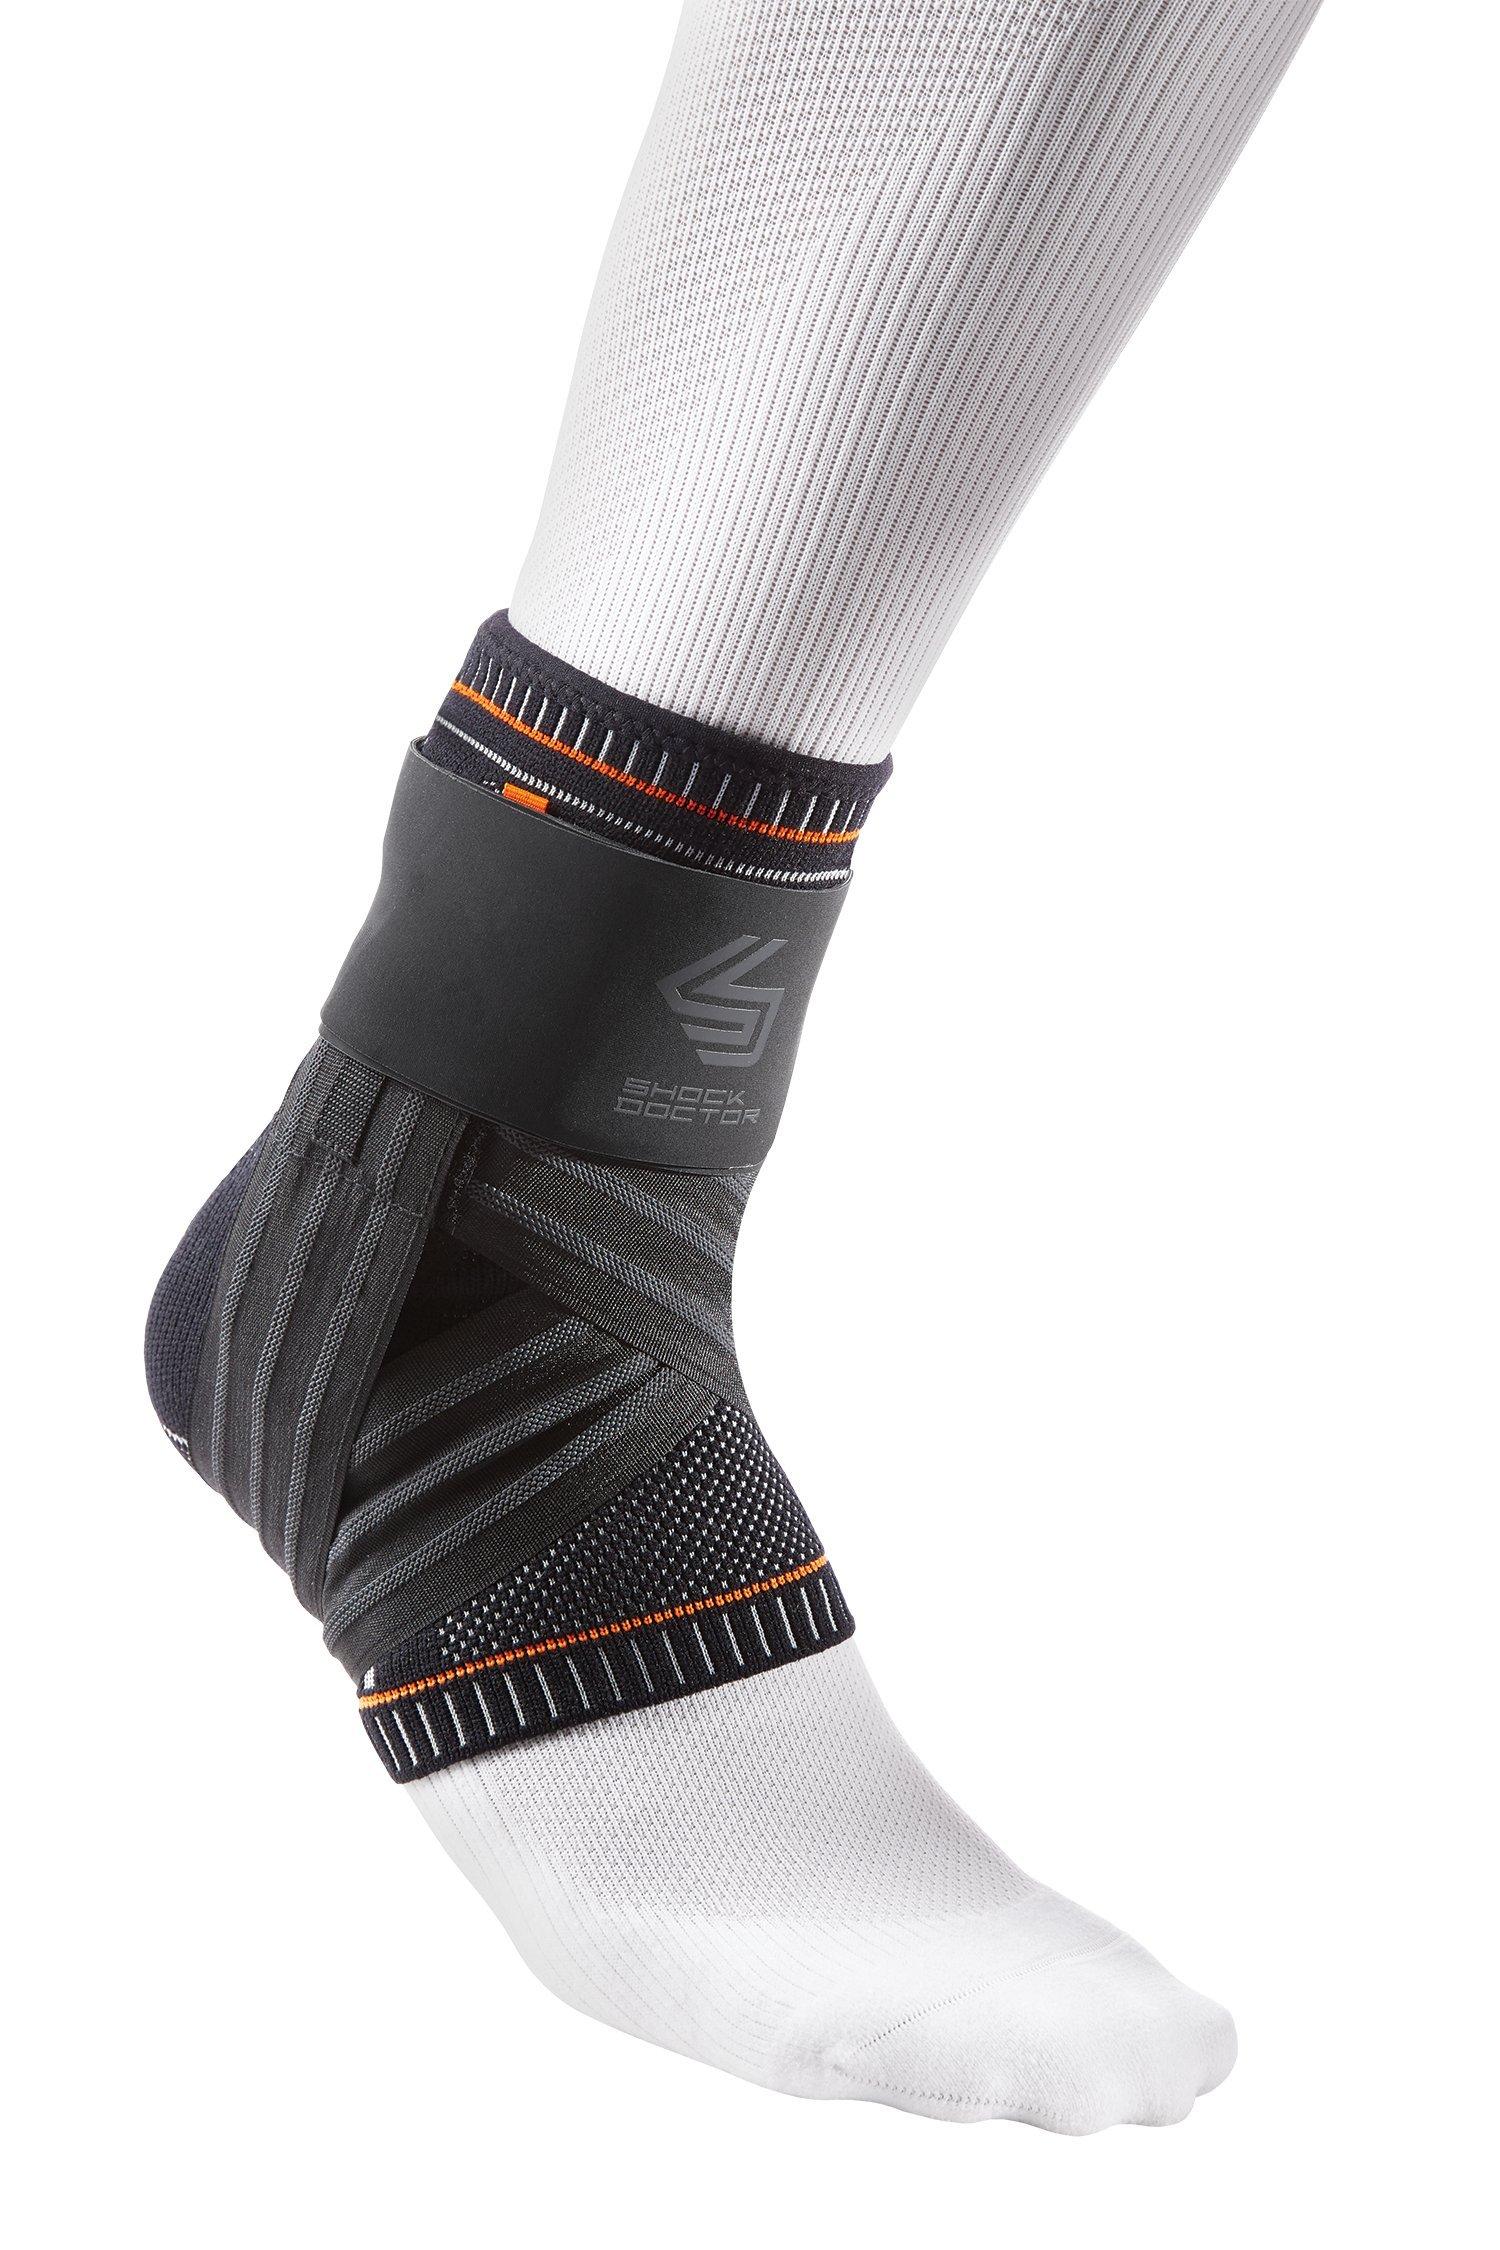 Shock Doctor Ultra Knit Ankle Brace W/Figure 6 Strap & Stays Black, Medium by Shock Doctor